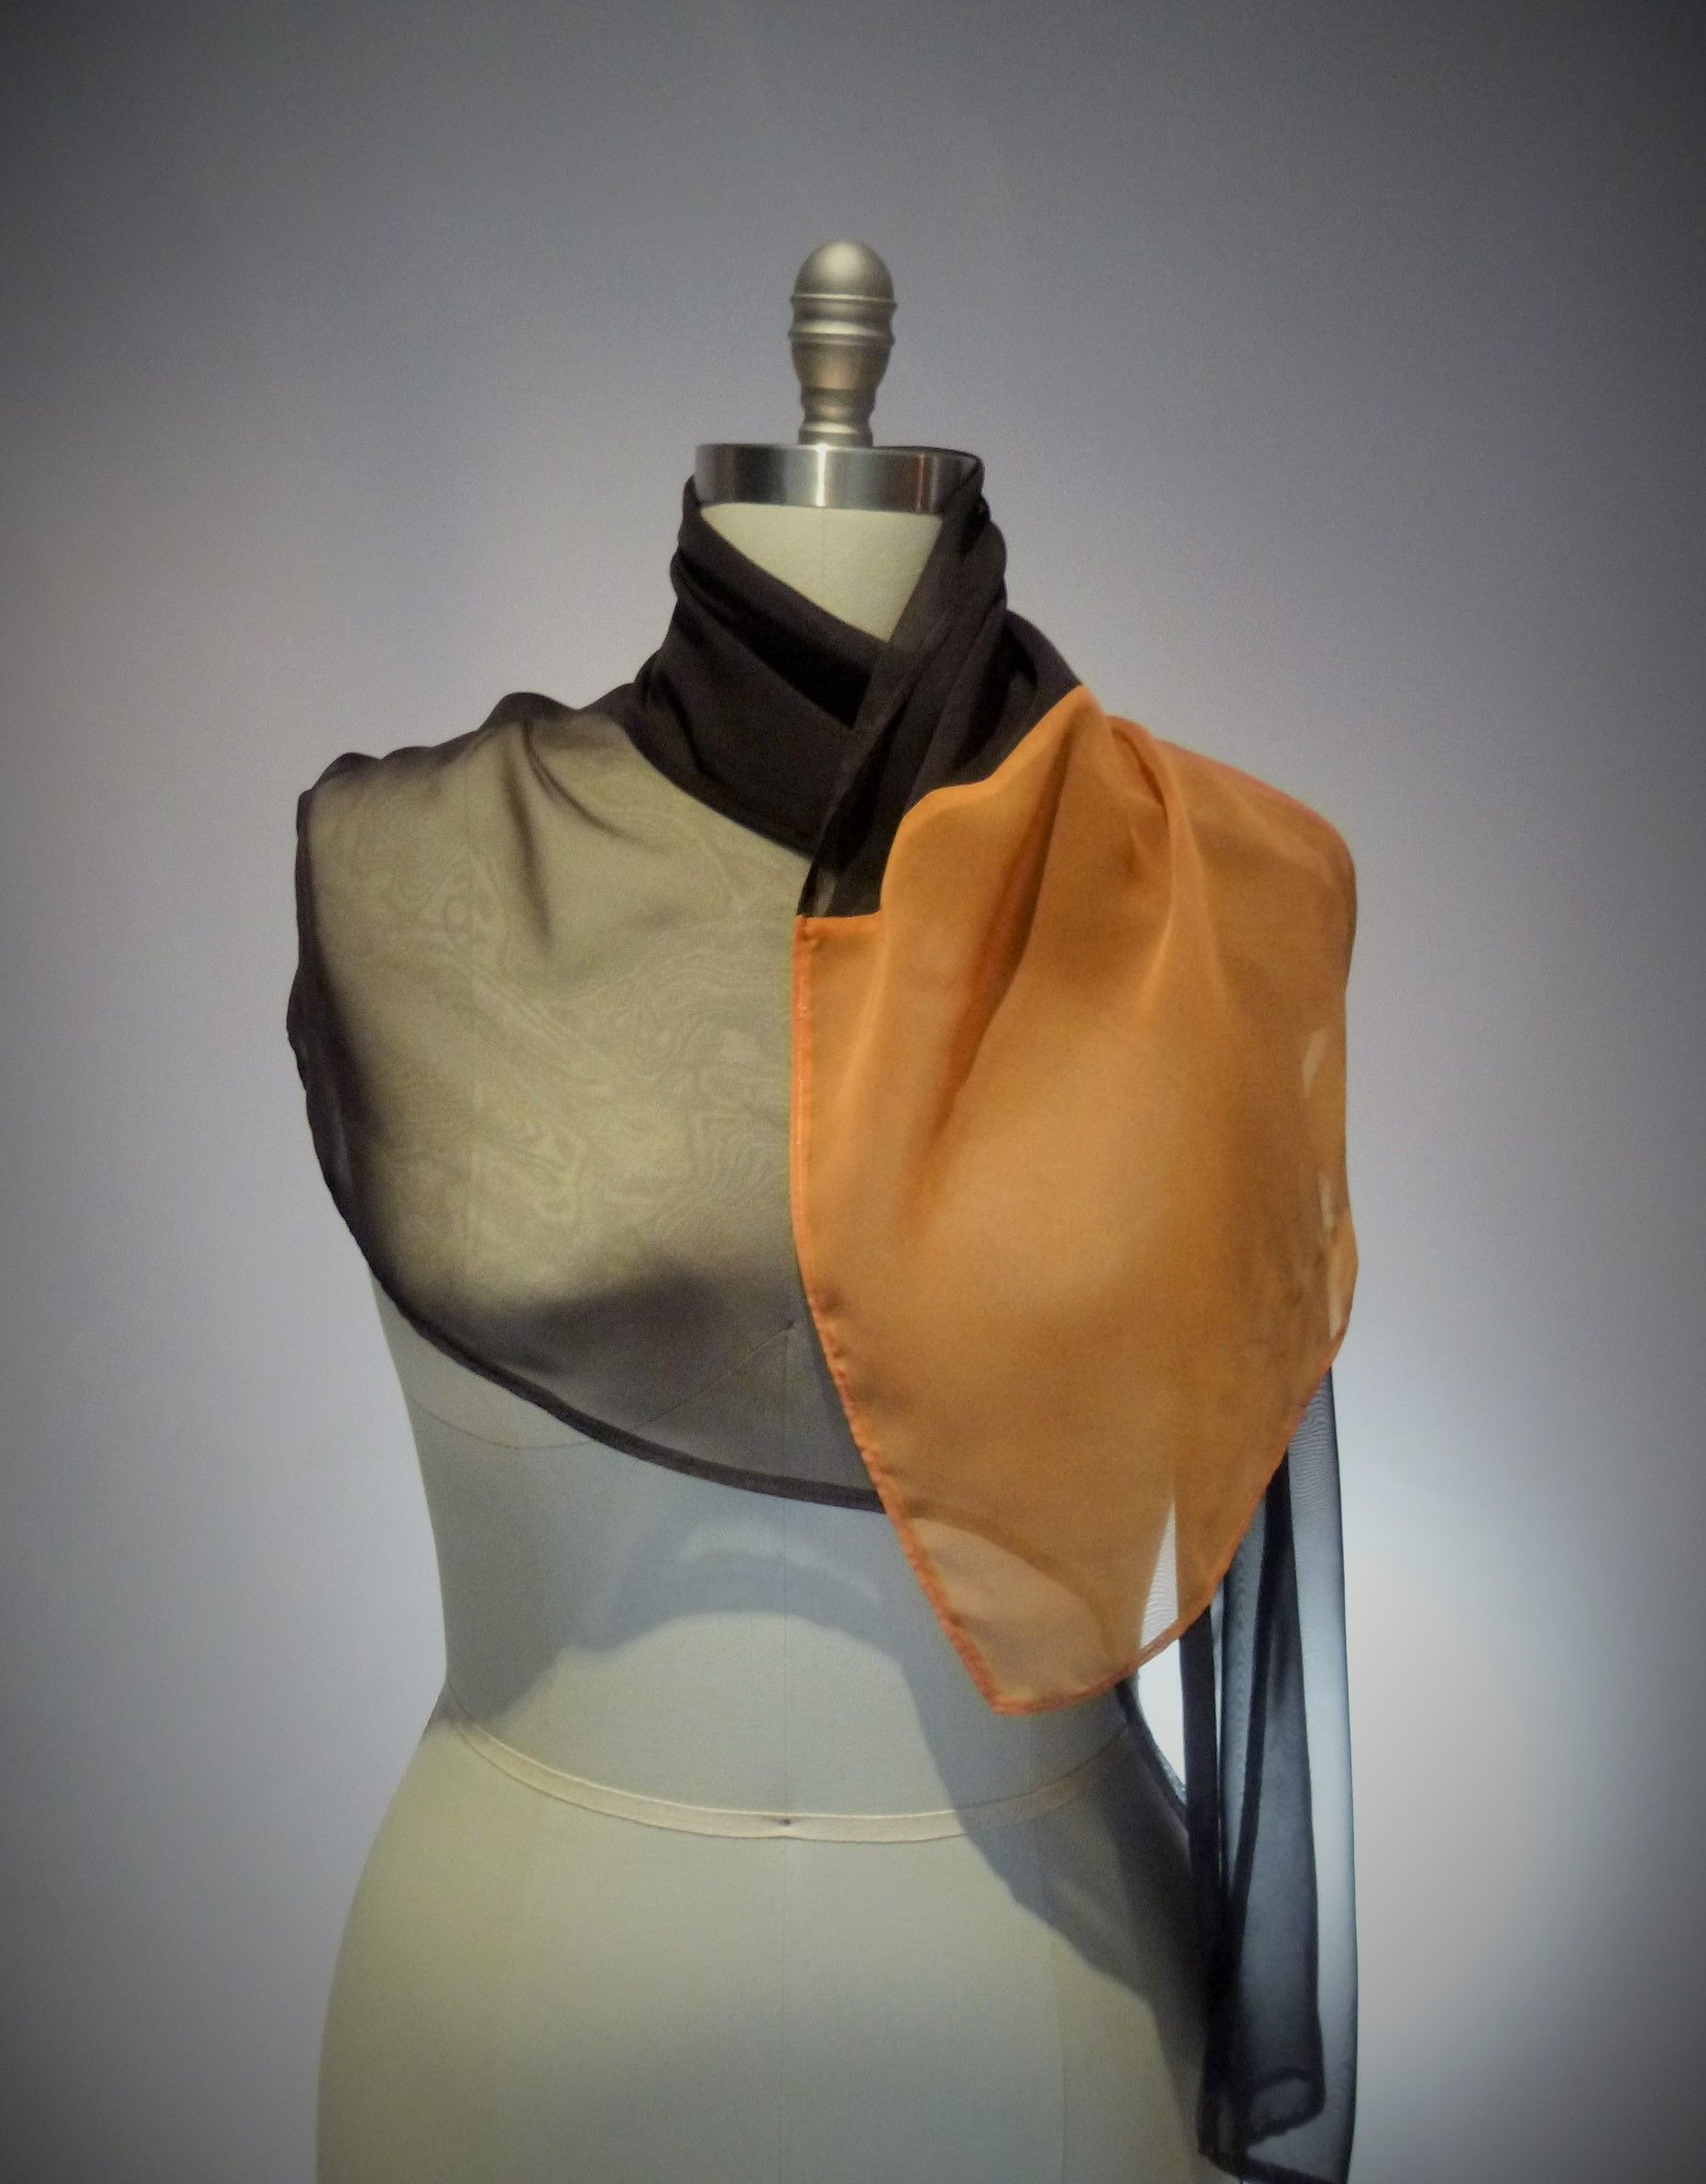 [rothko-inspired scarf]